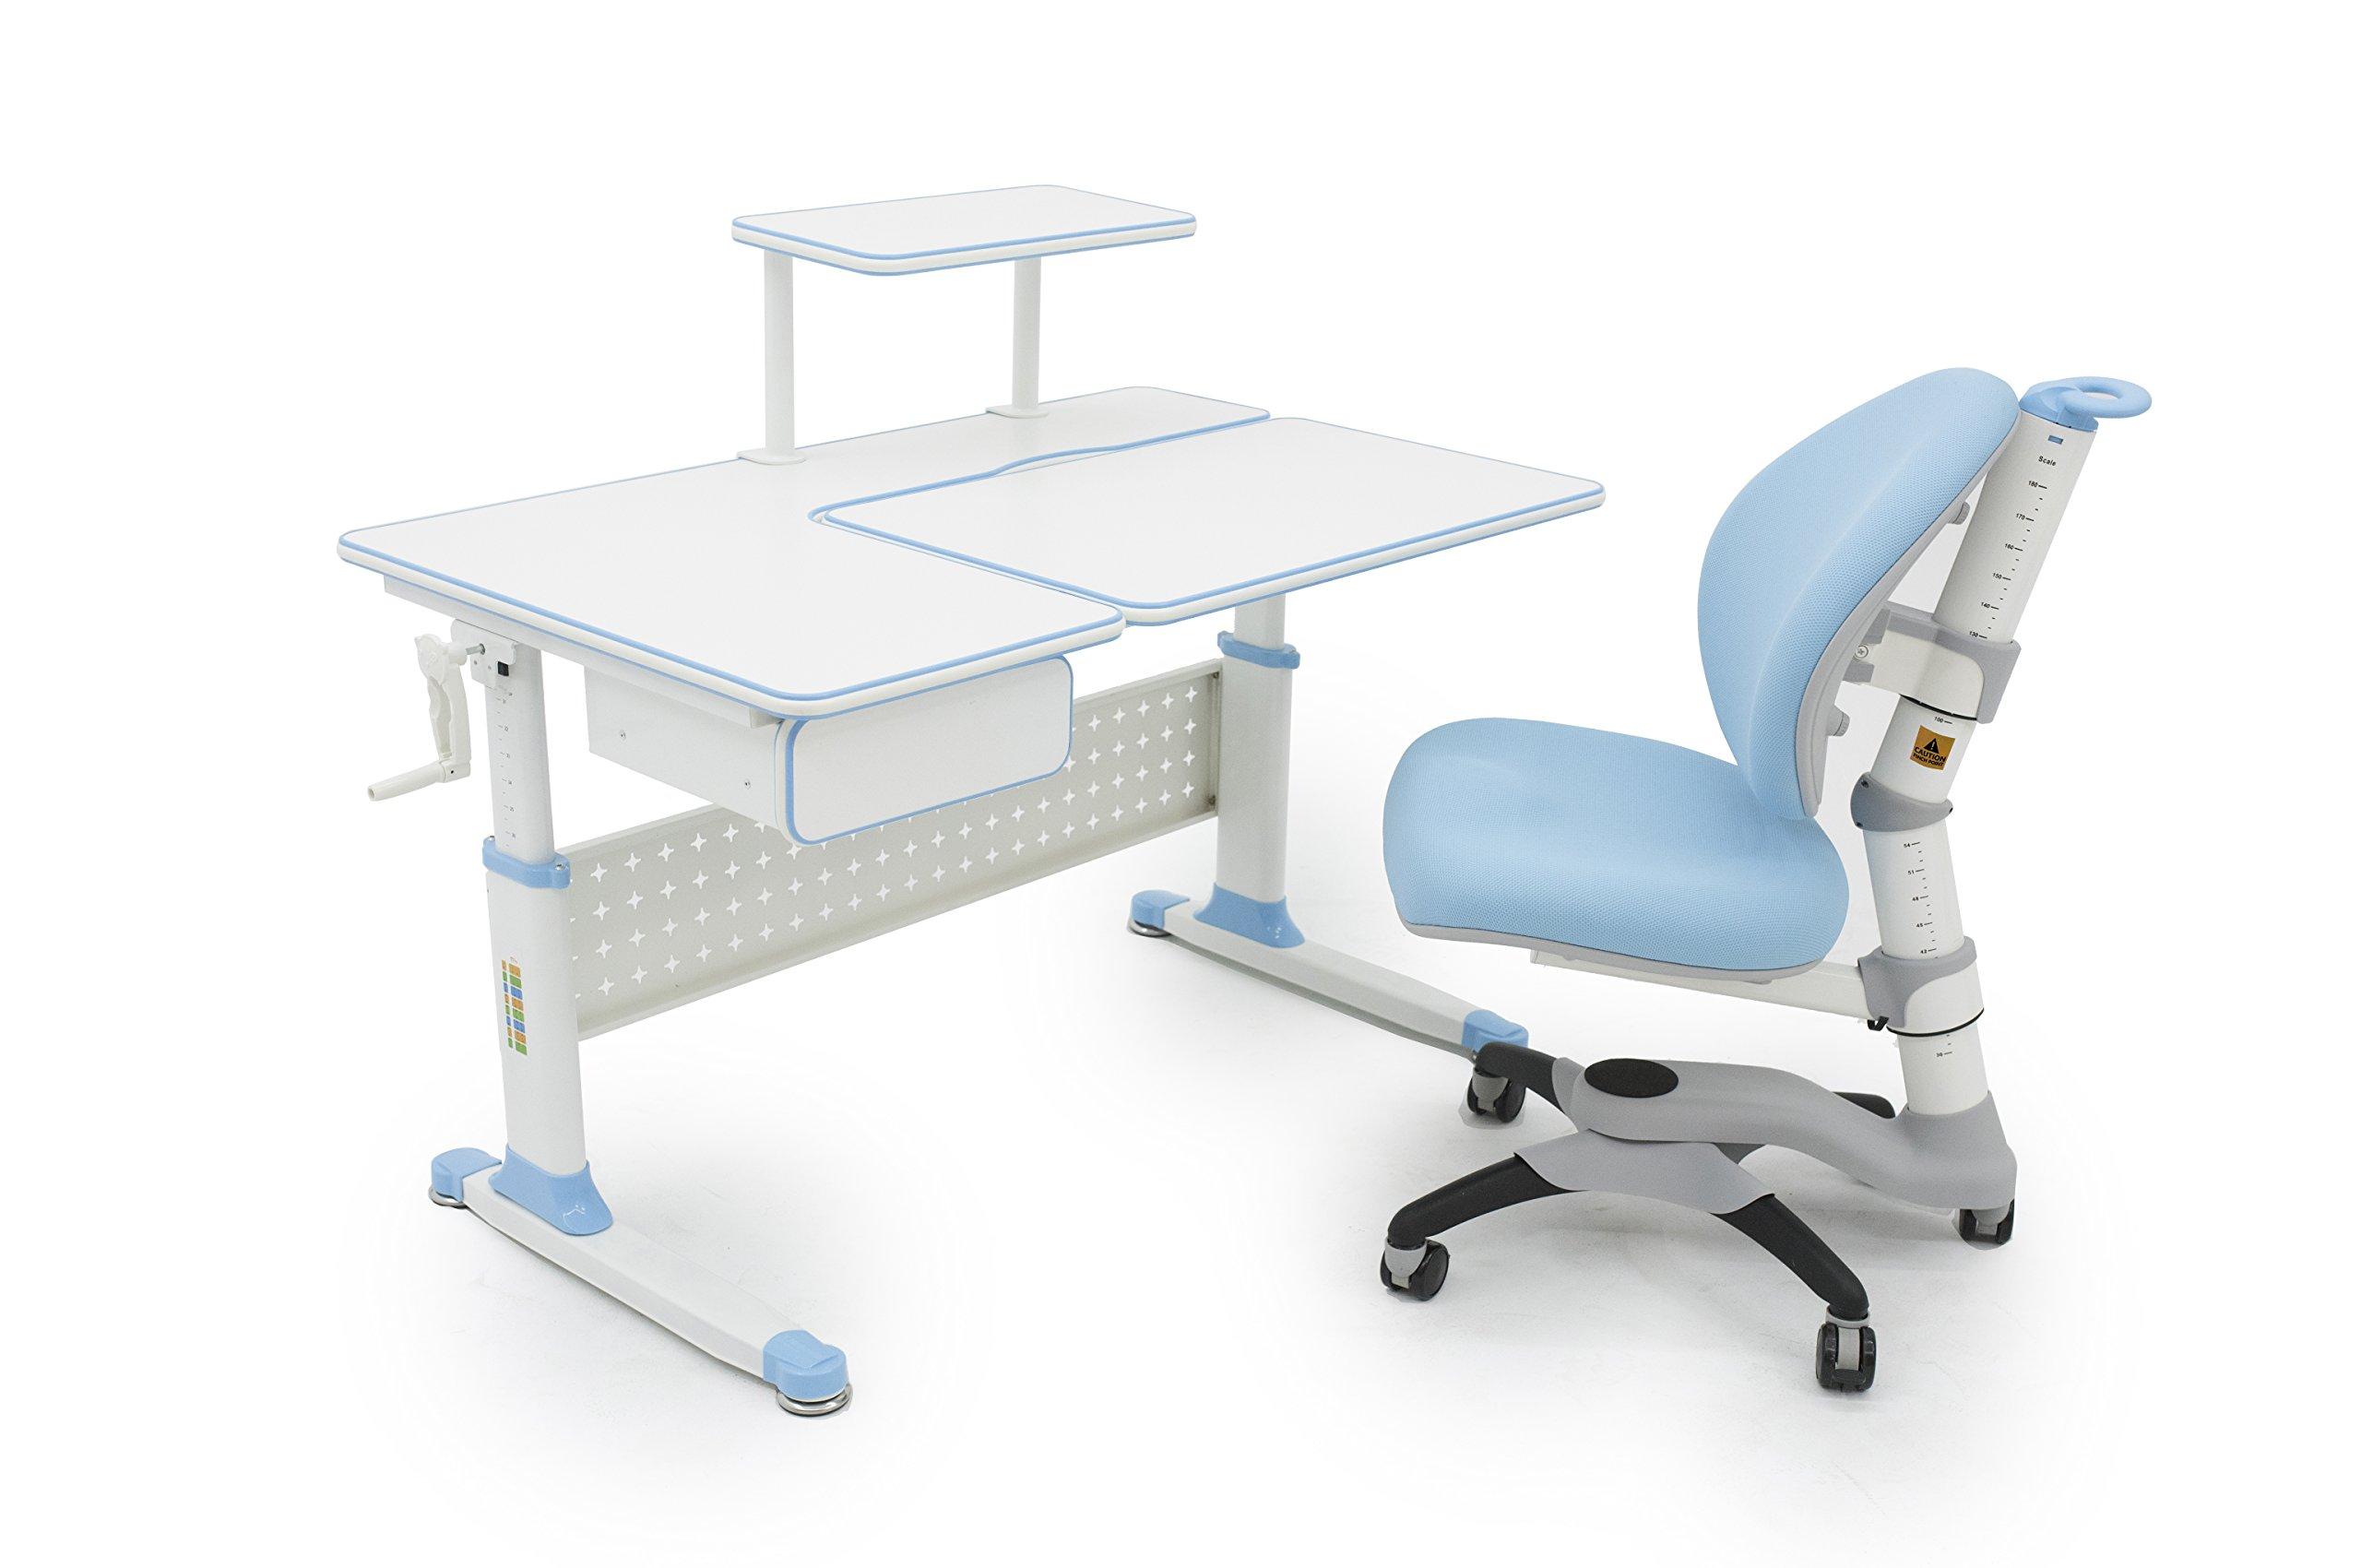 ApexDesk Little Soleil DX 43'' Children's Height Adjustable Study Desk w/ Integrated Shelf & Drawer (Desk+Chair Bundle in Blue) by ApexDesk